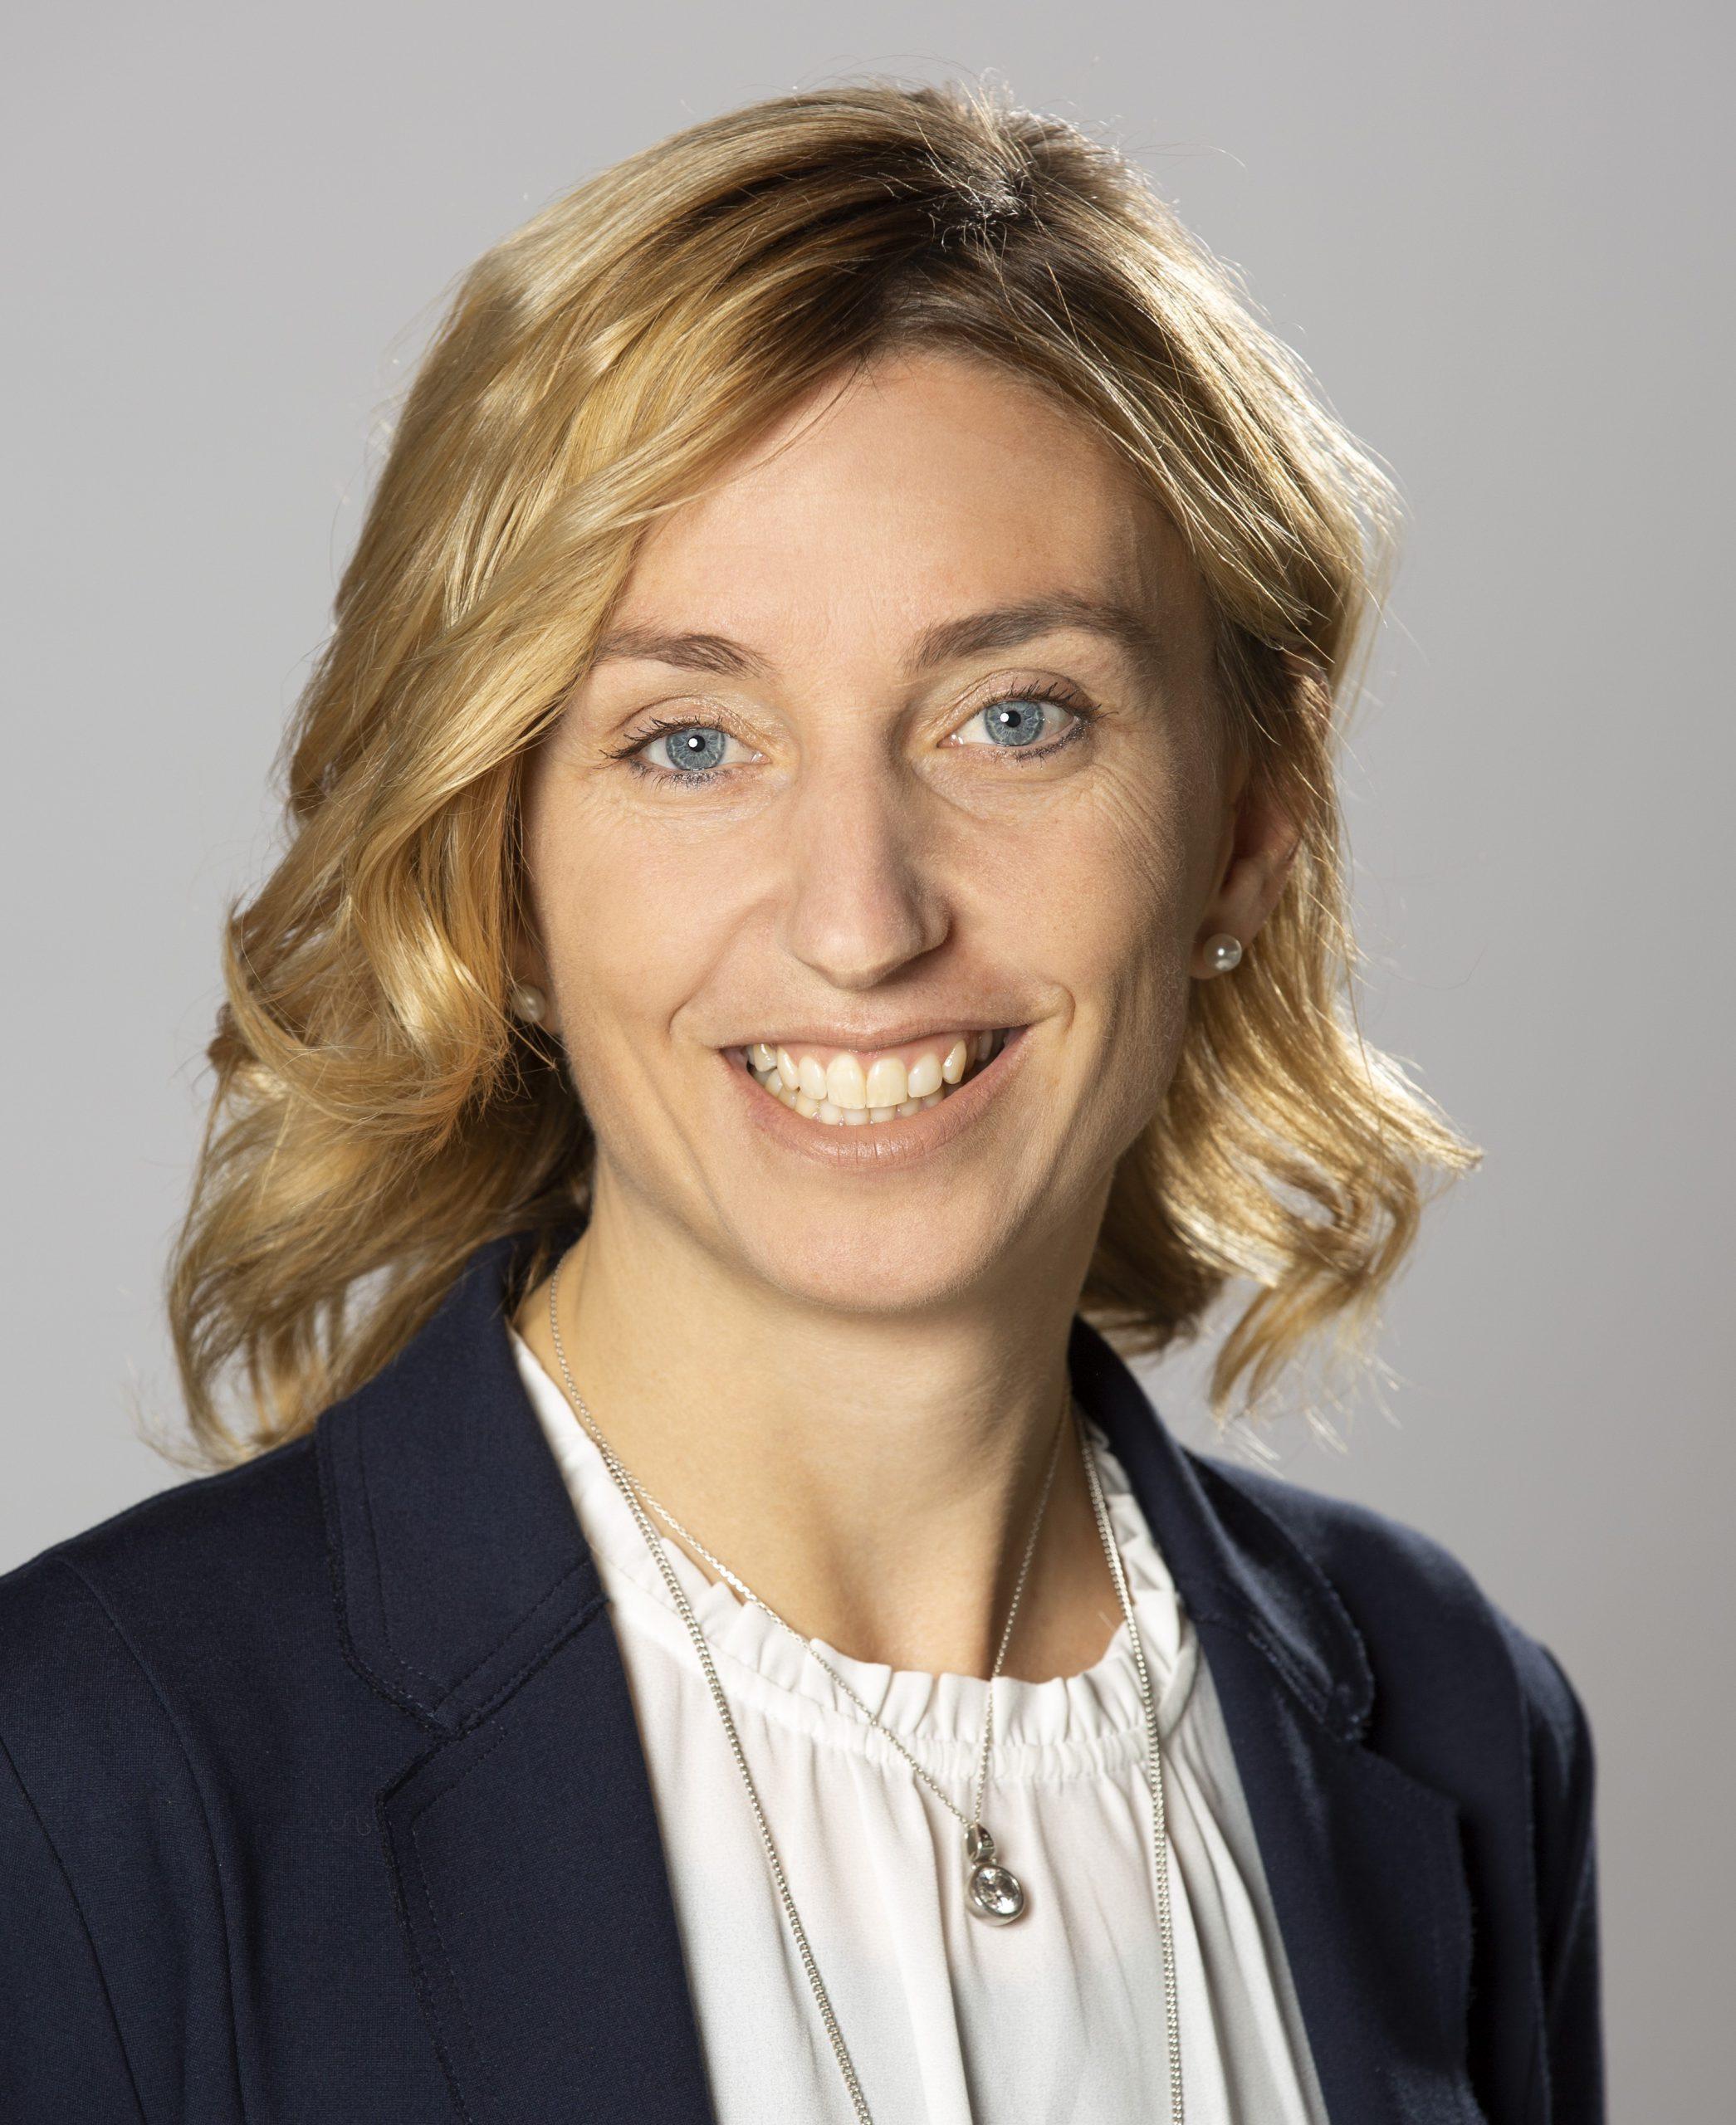 ganz+WERT - Susanne Hofer